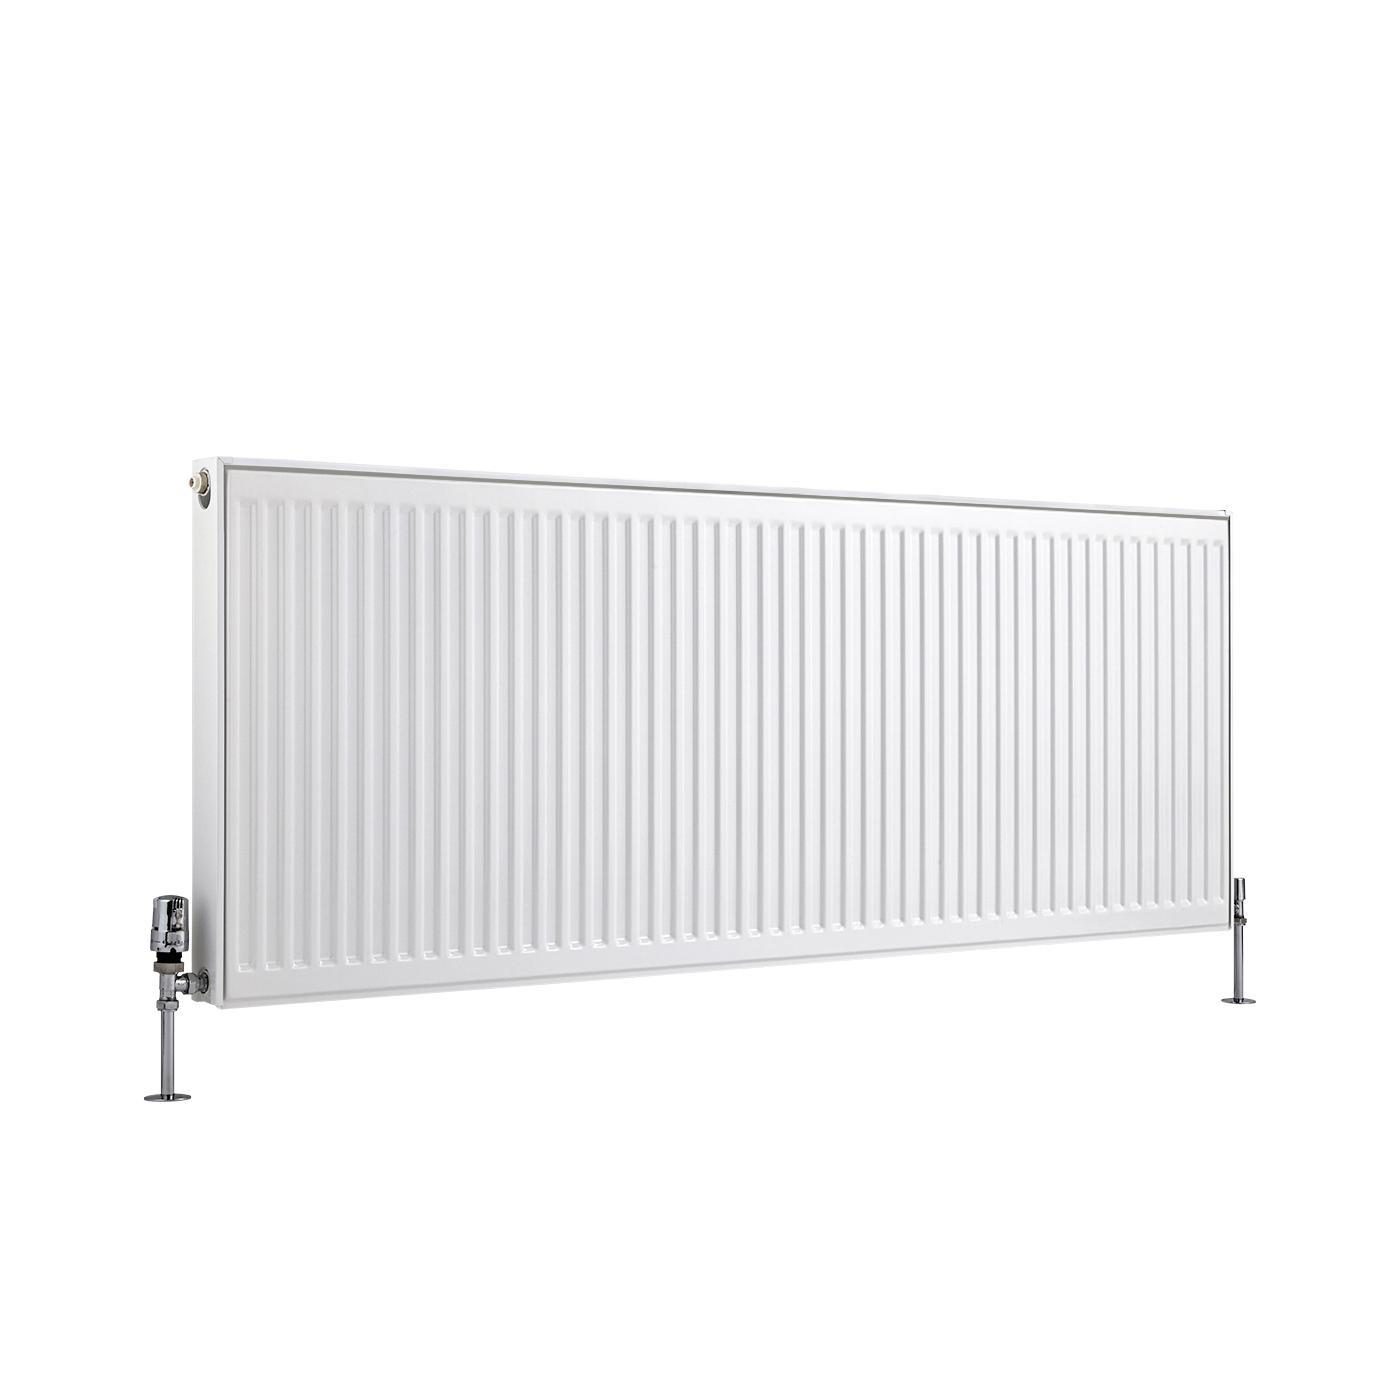 Radiateur À Panneaux Type 11 Horizontal Blanc Eco 60cm x 160cm x 5cm 1482 Watts